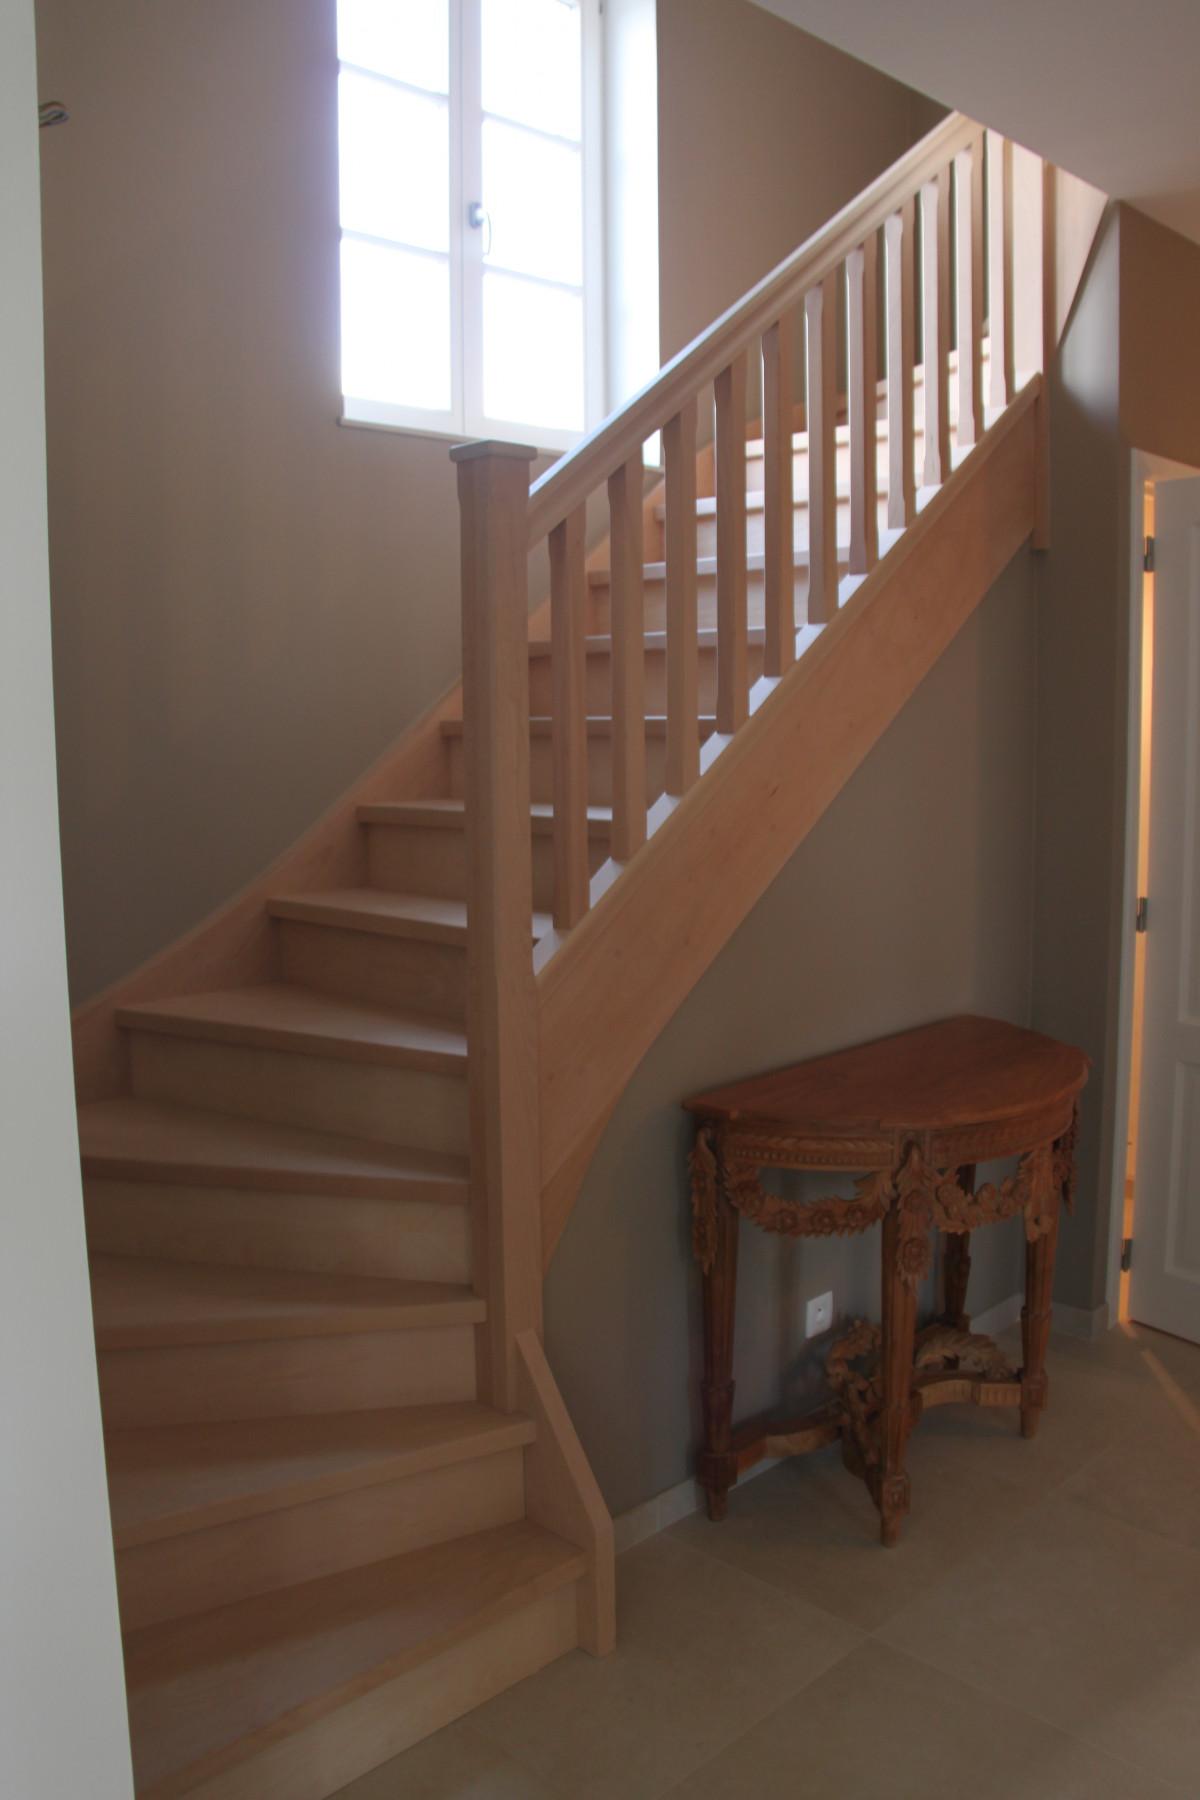 escalier en h tre menuiserie jugnot marc. Black Bedroom Furniture Sets. Home Design Ideas